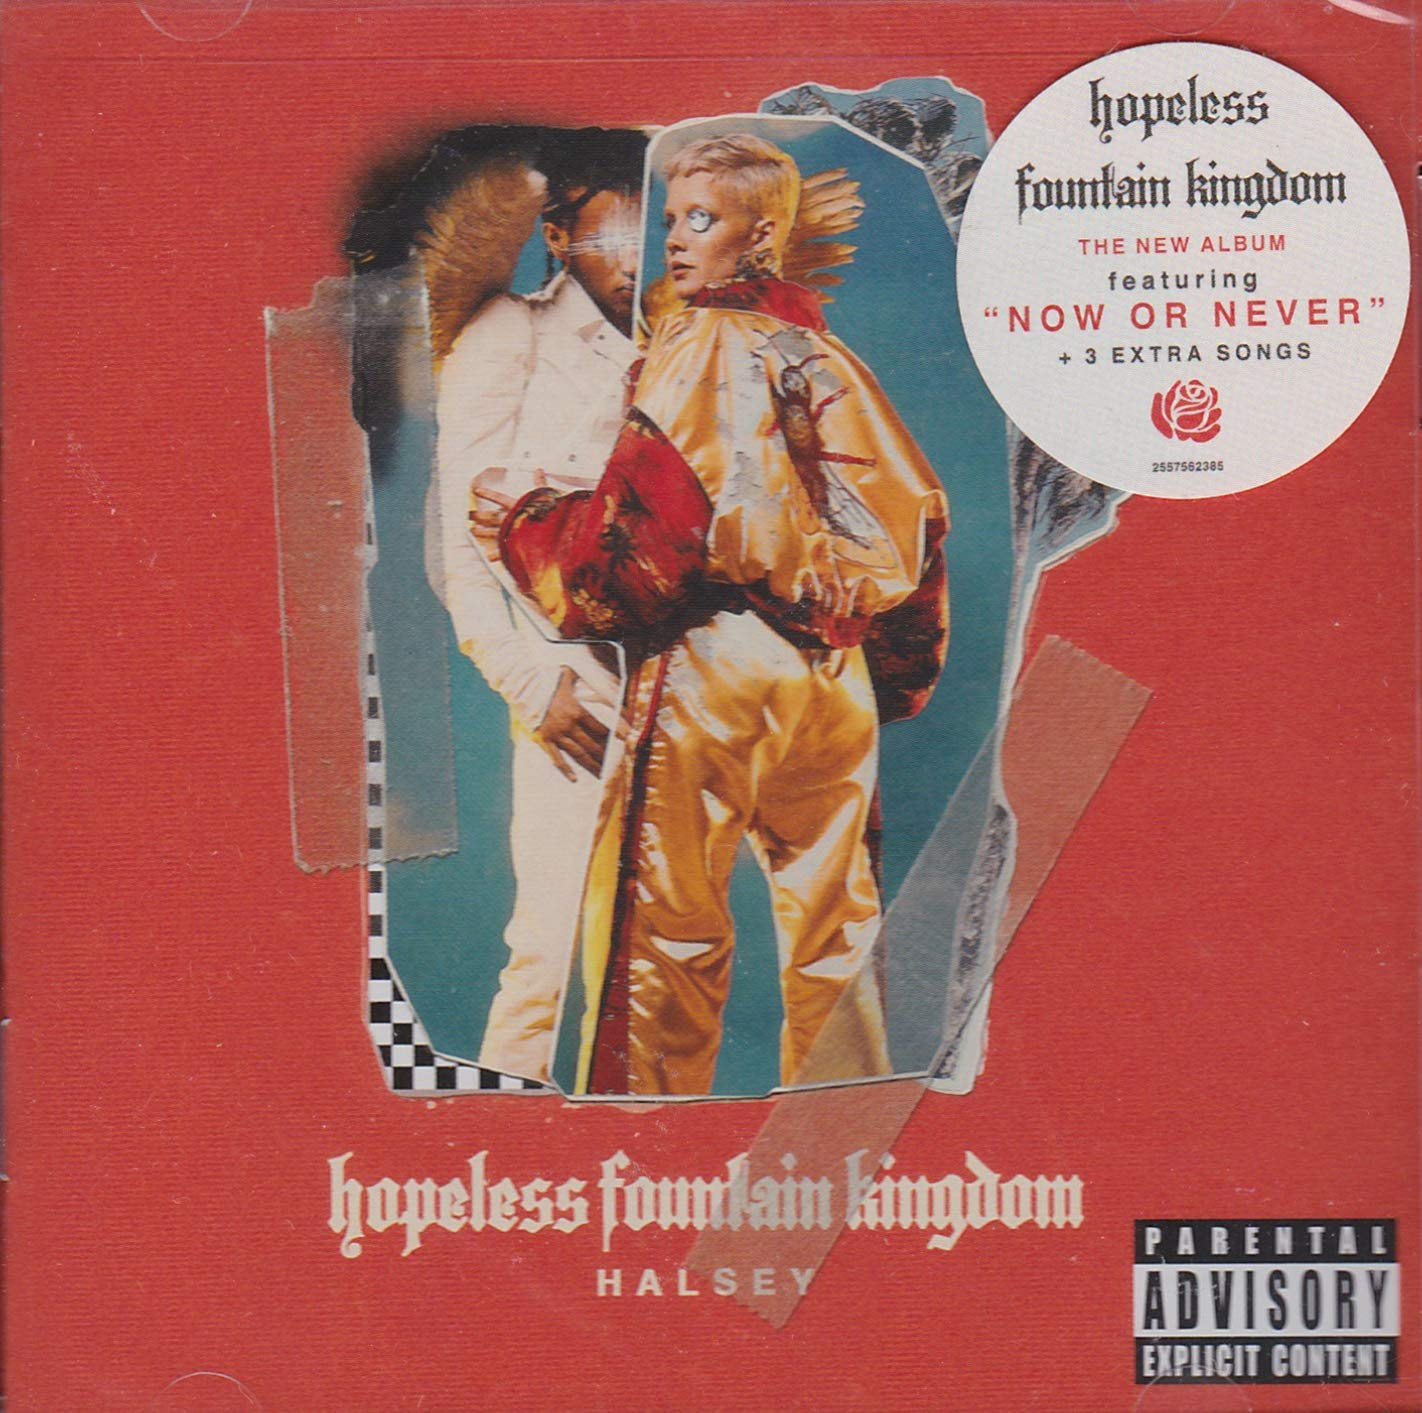 HALSEY Hopeless Fountain Kingdom LIMITED EXPANDED TARGET ED CD